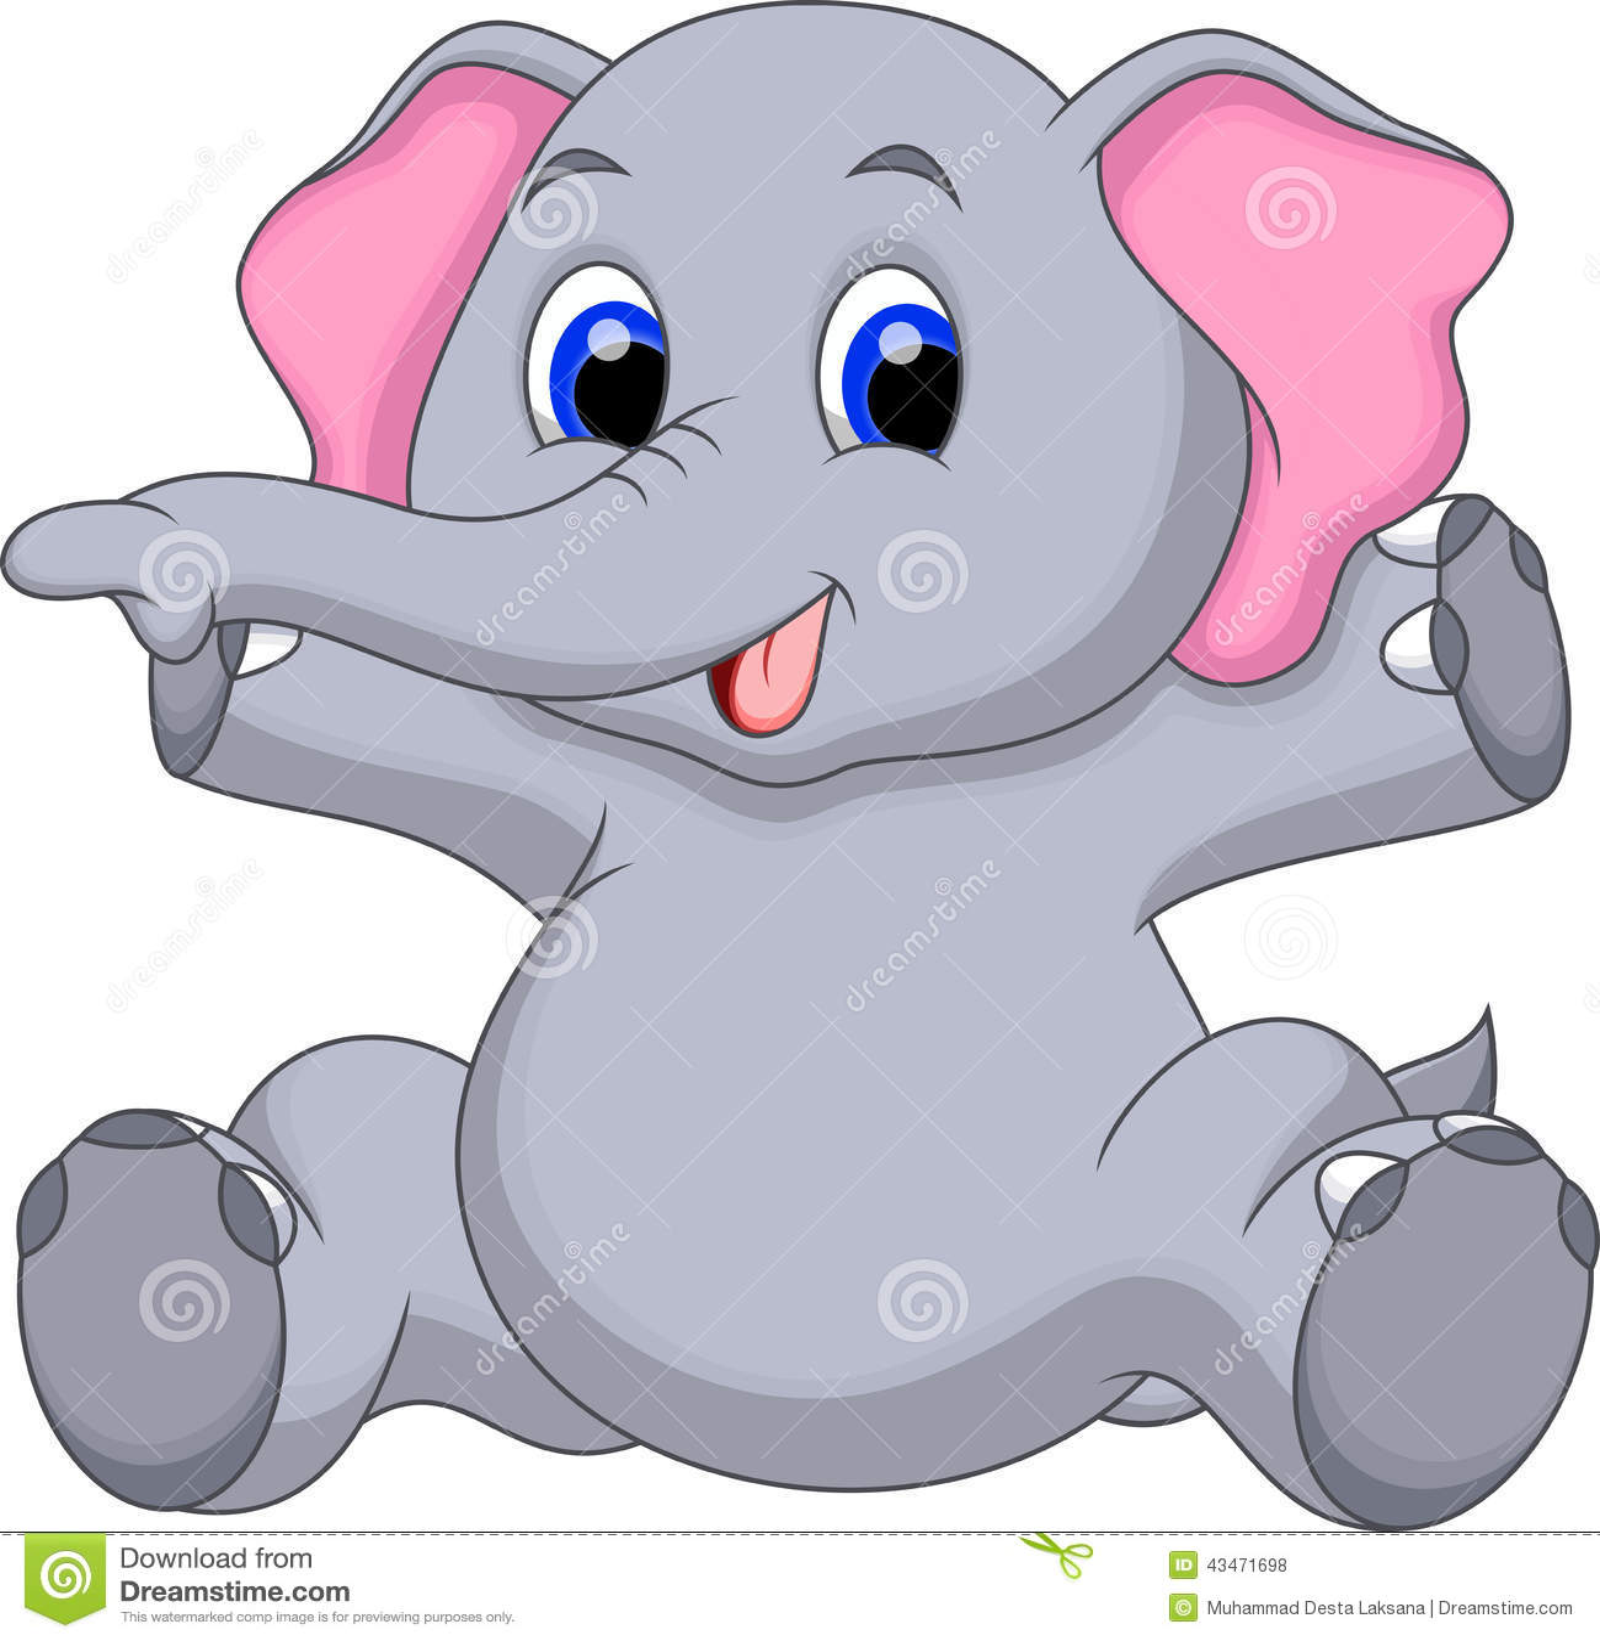 Cute Baby Elephant Cartoon Stock Illustration - Image ...